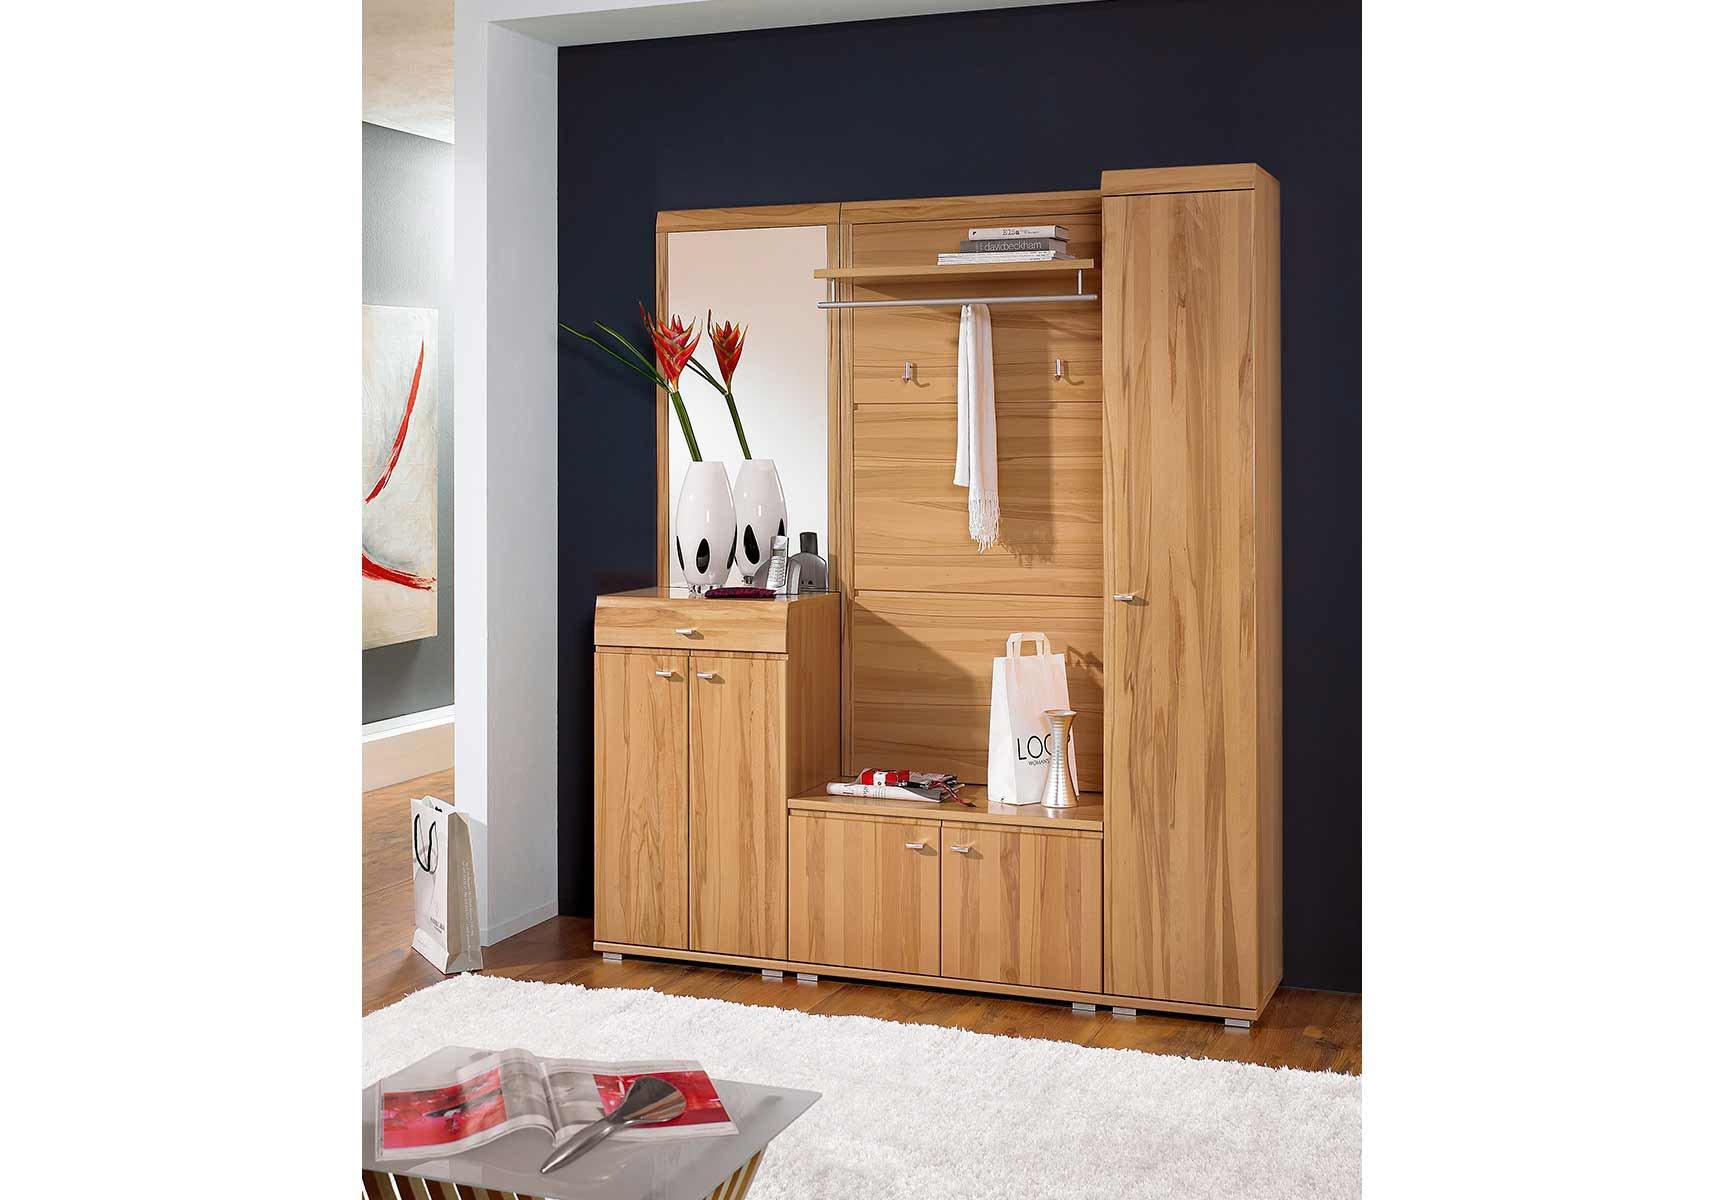 garderobe bozen 4810 leinkenjost m bel letz ihr online shop. Black Bedroom Furniture Sets. Home Design Ideas